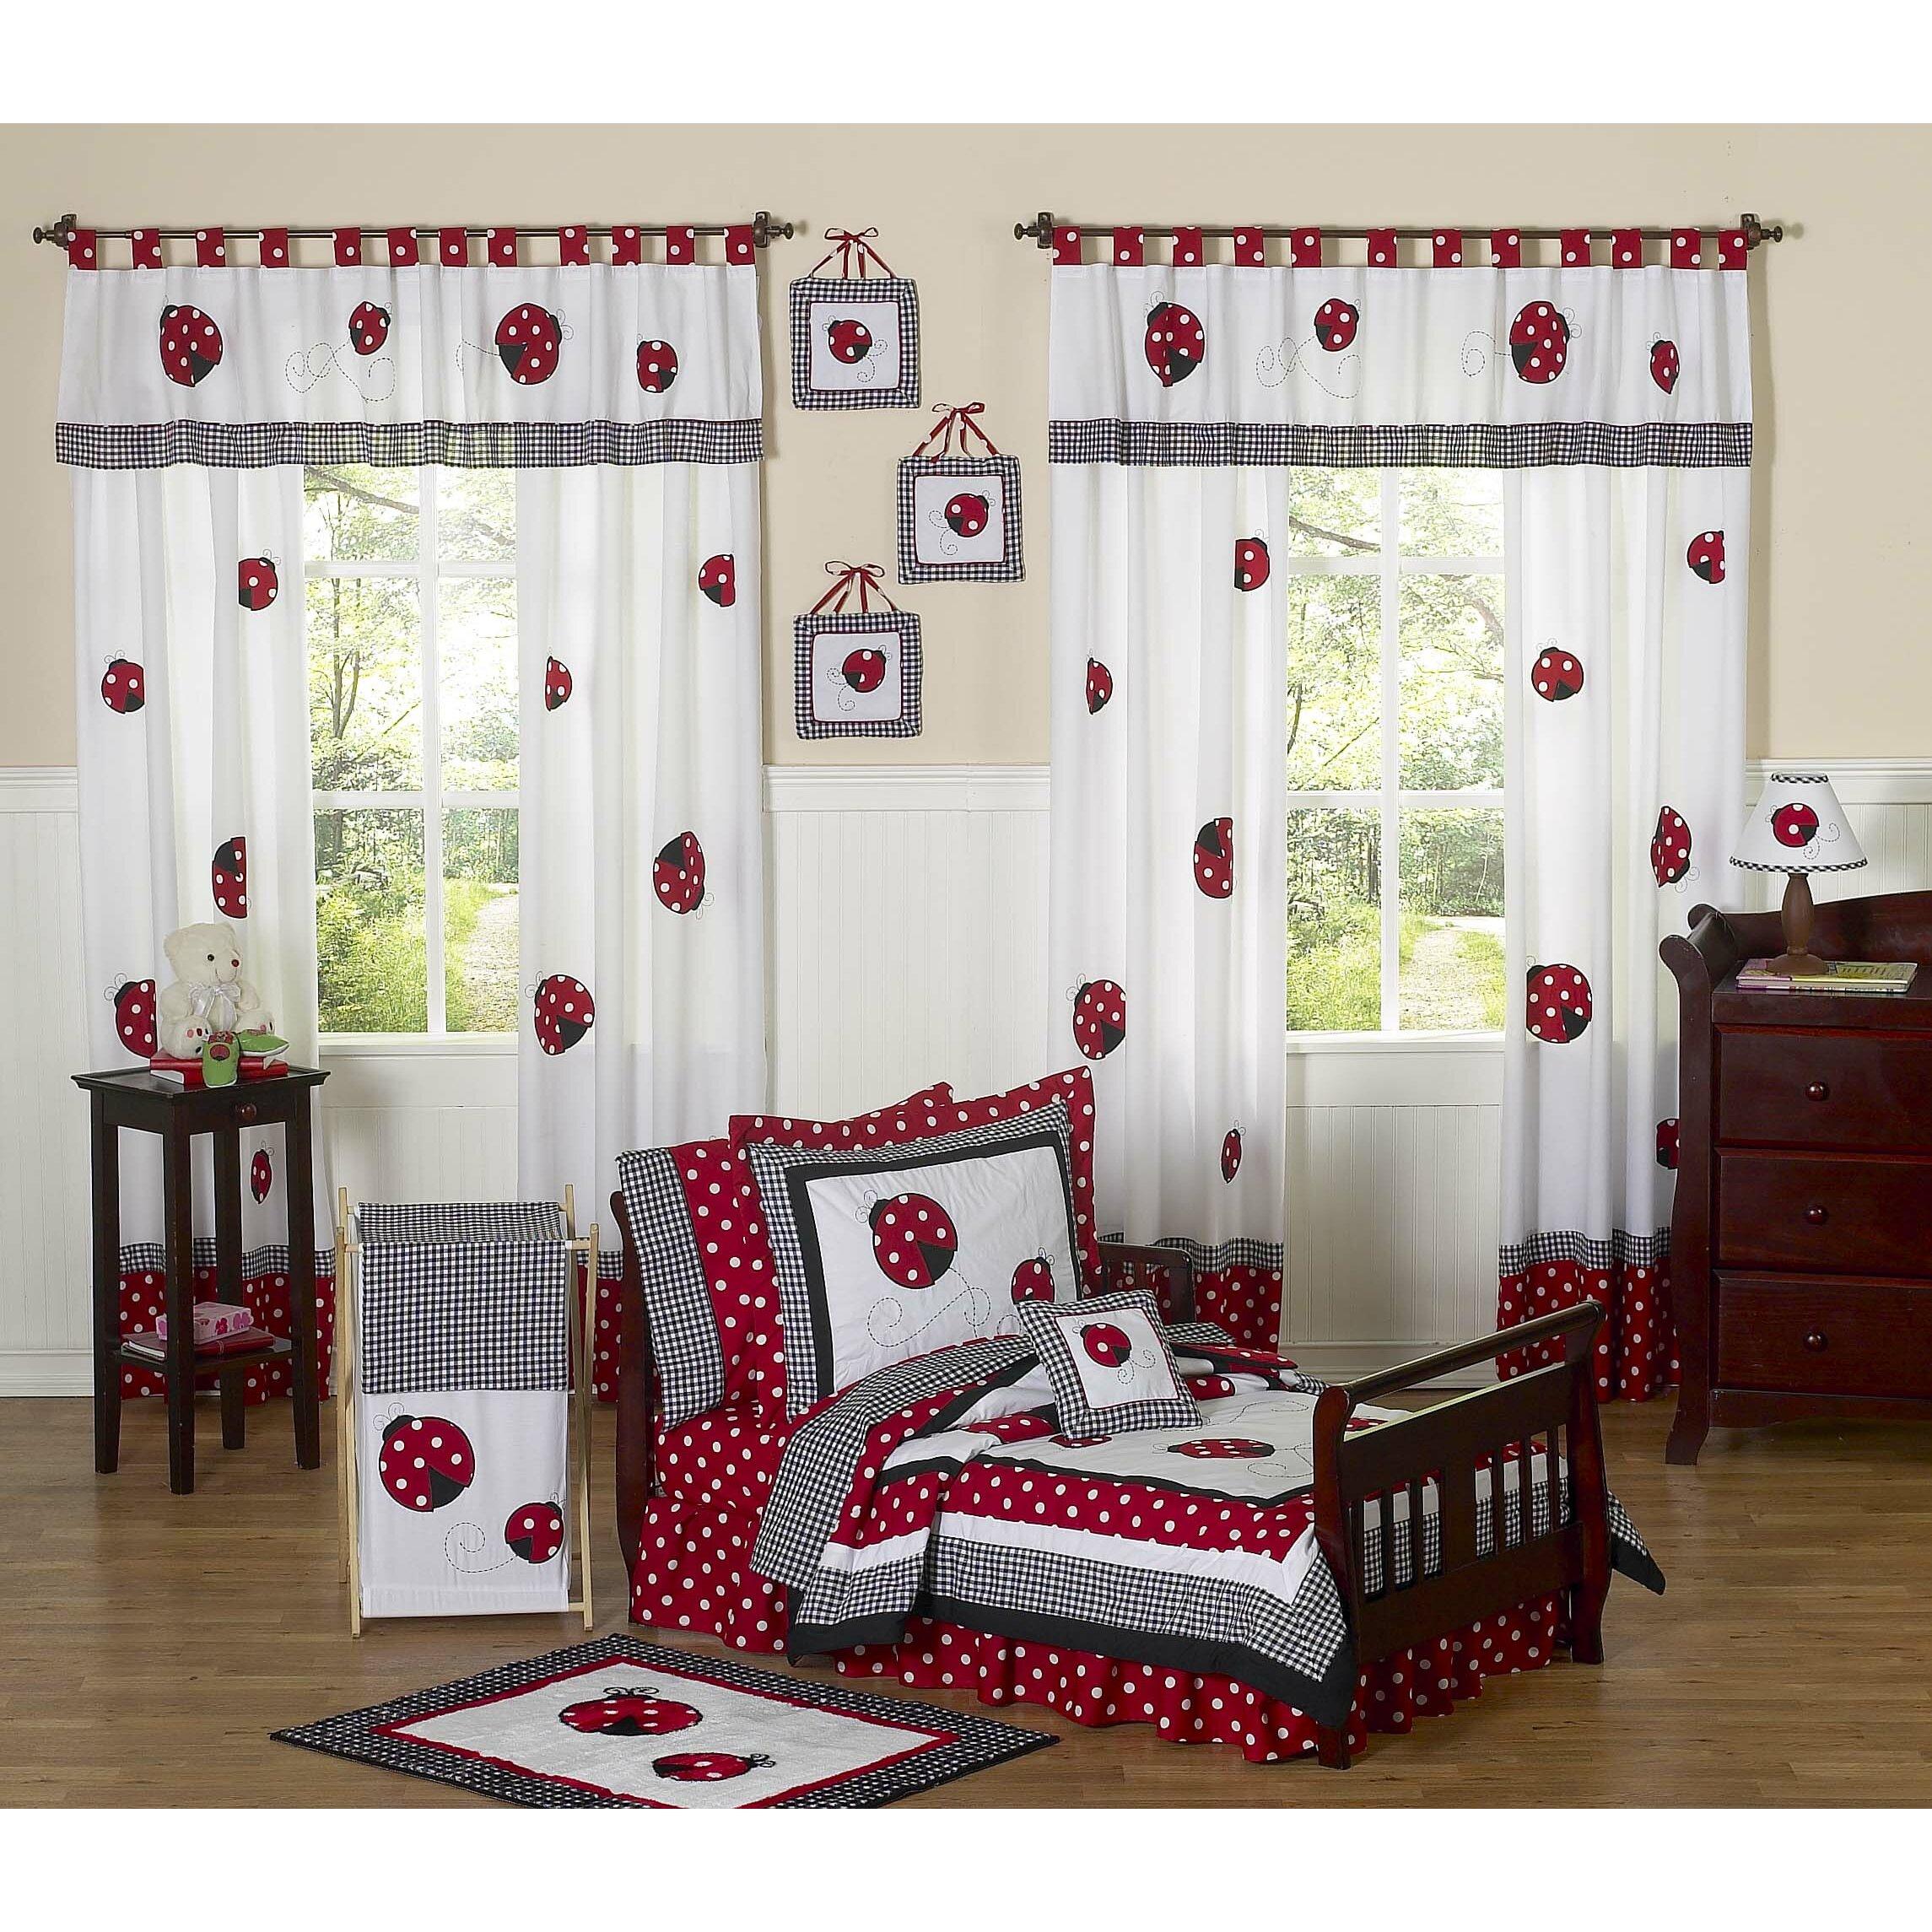 "79 Handpicked Dining Room Ideas For Sweet Home: Sweet Jojo Designs Little Ladybug 84"" Curtain Valance"